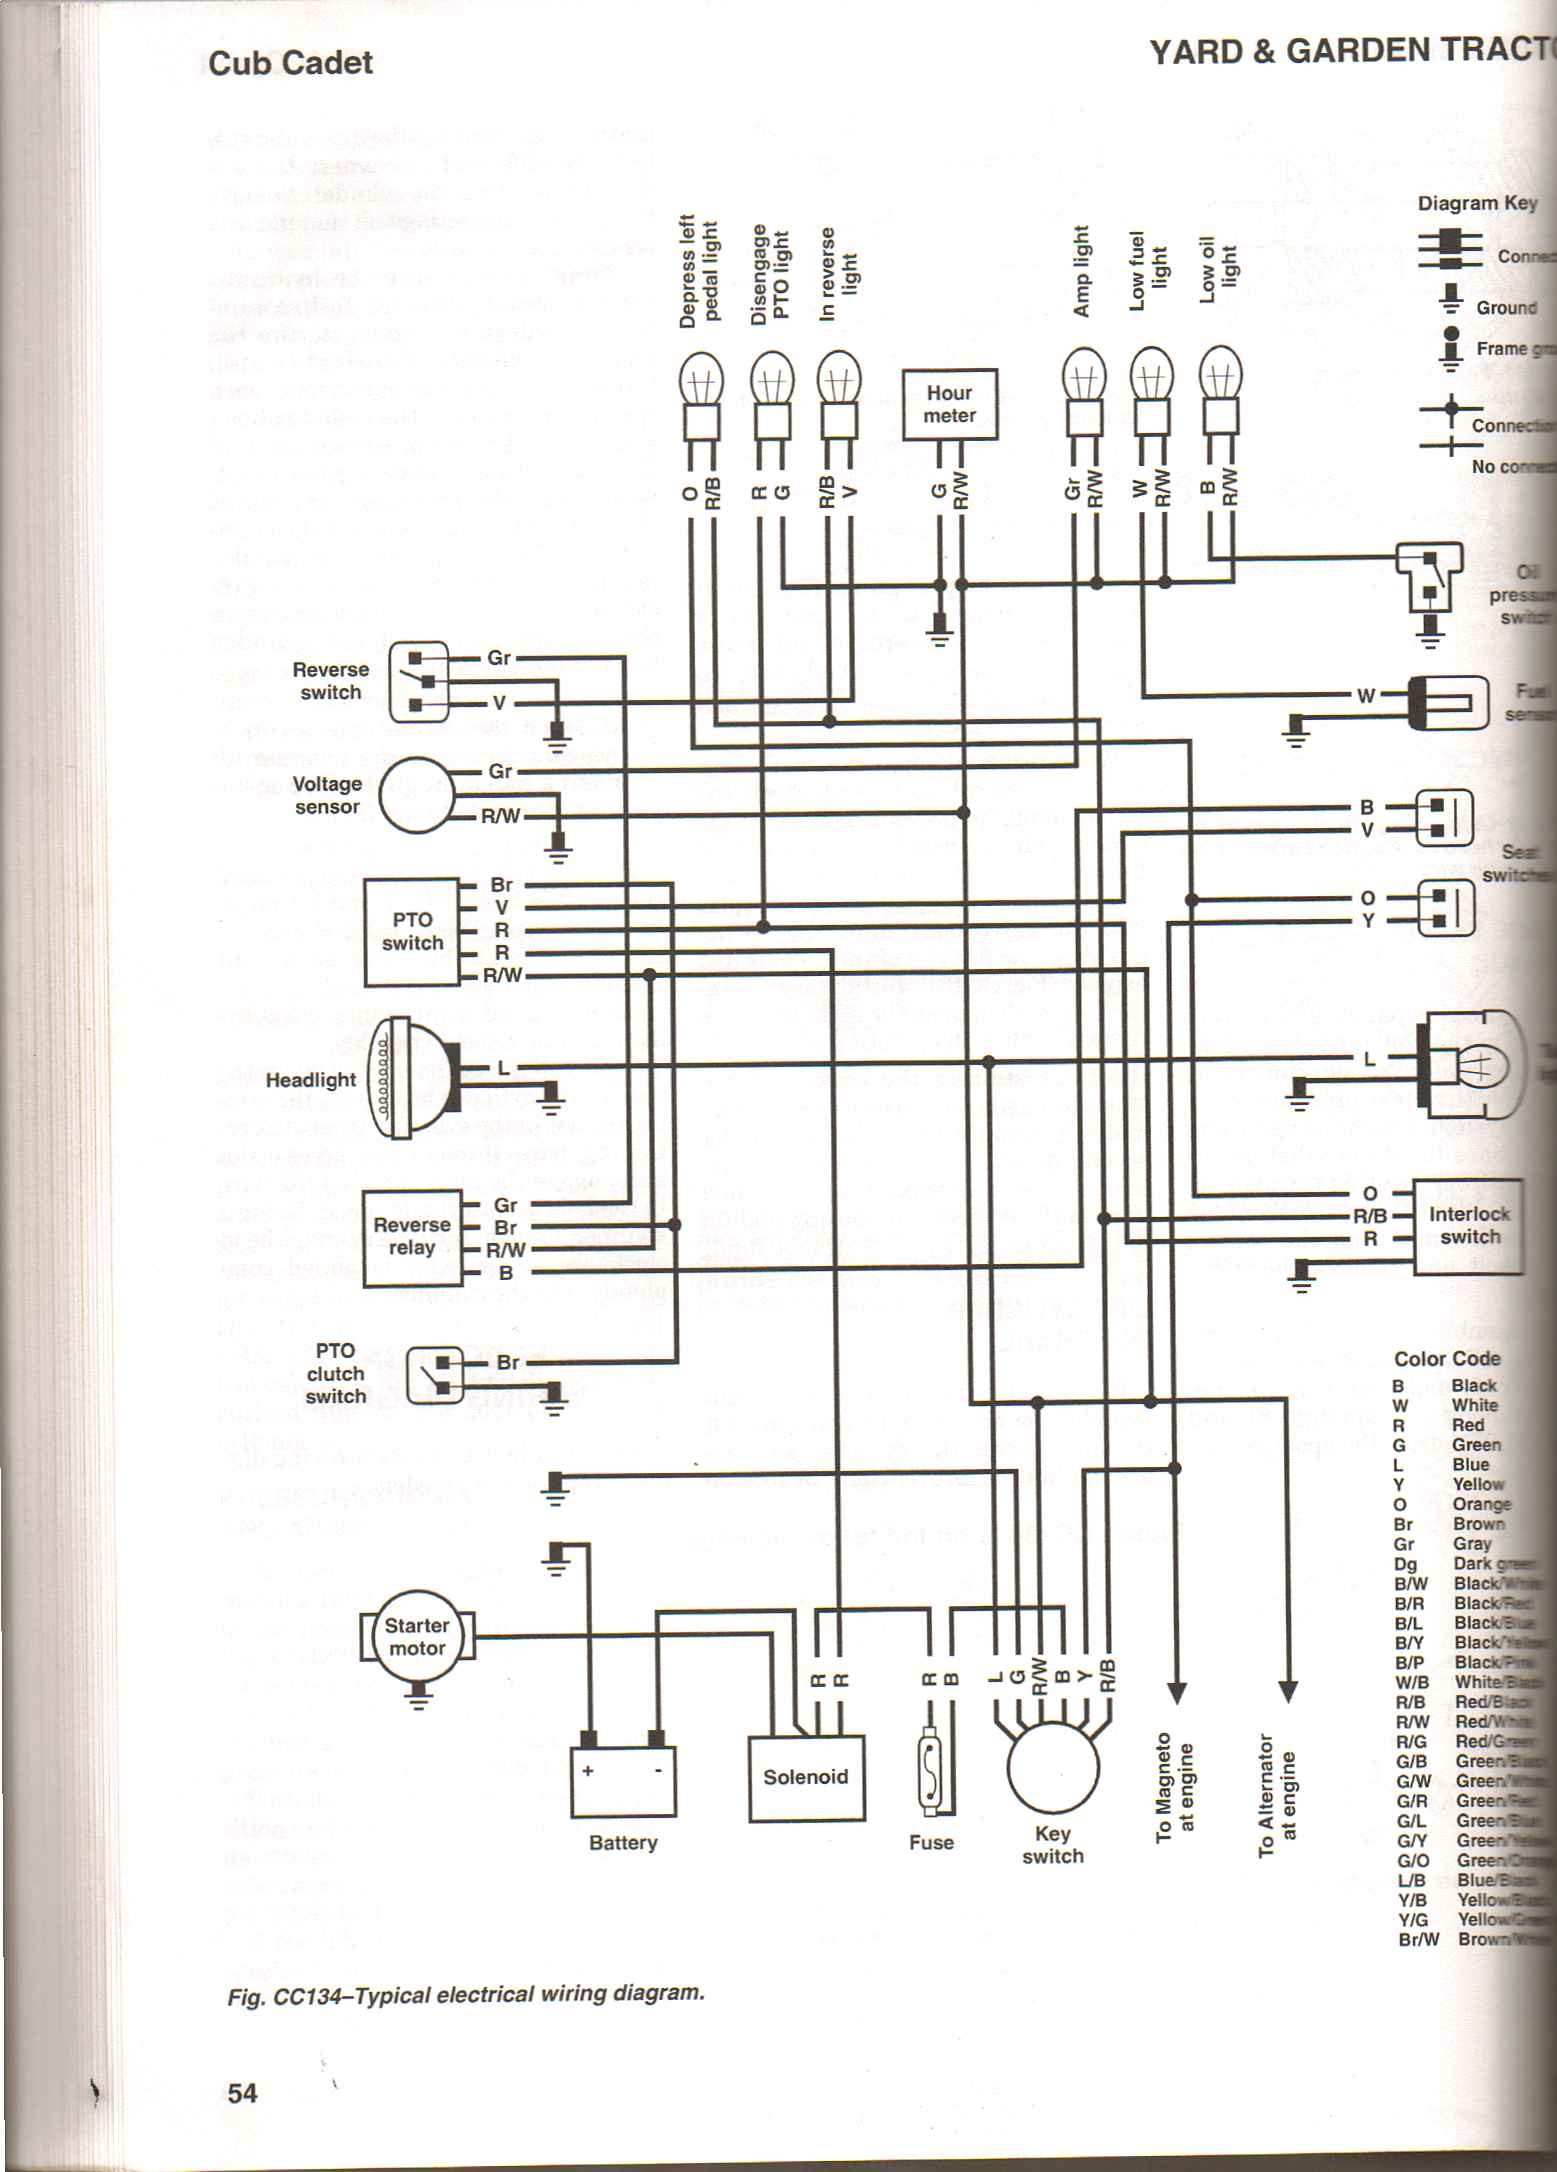 [SCHEMATICS_48ZD]  XV_8421] 1440 Cub Cadet Electric Wiring Diagram Schematic Wiring   Cub Cadet 1450 Wiring Diagram      Cran Benkeme Mohammedshrine Librar Wiring 101